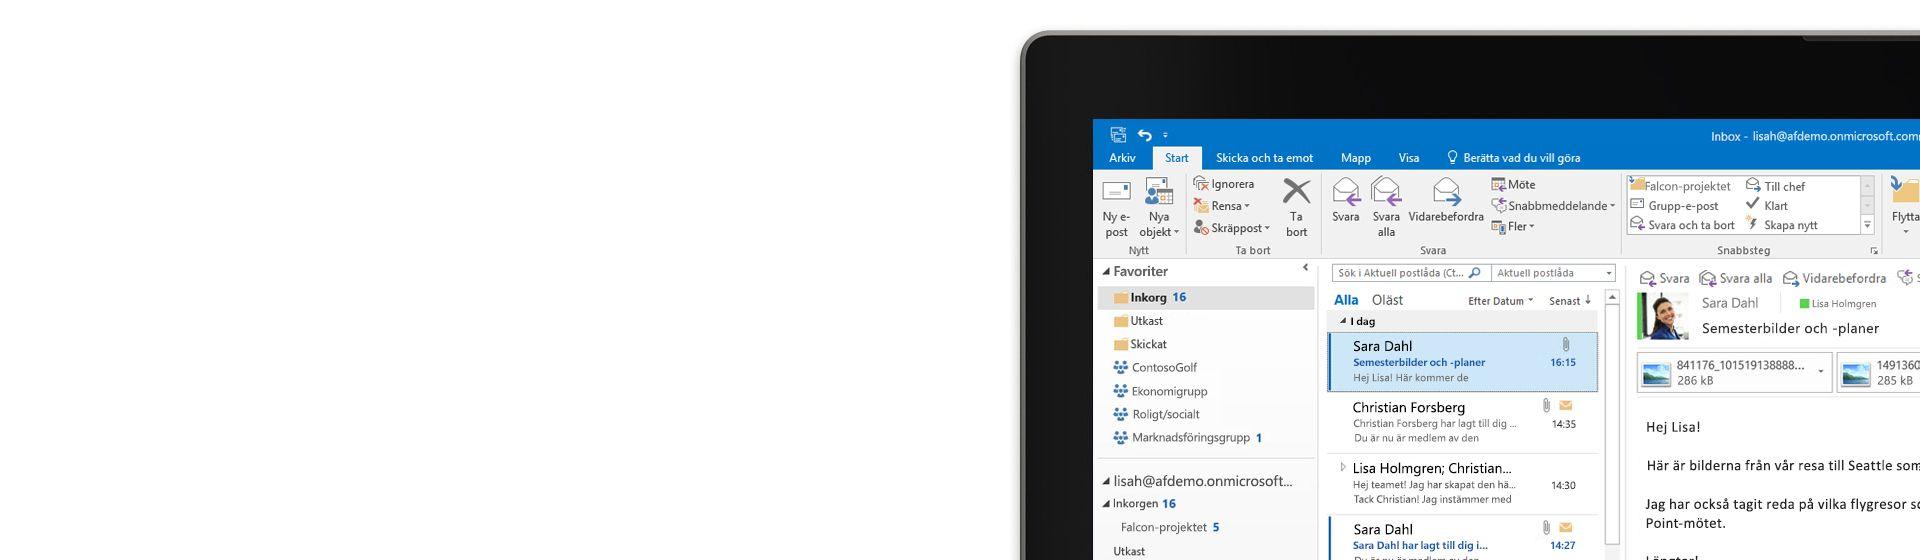 Hörnet av en datorskärm som visar en inkorg i Outlook